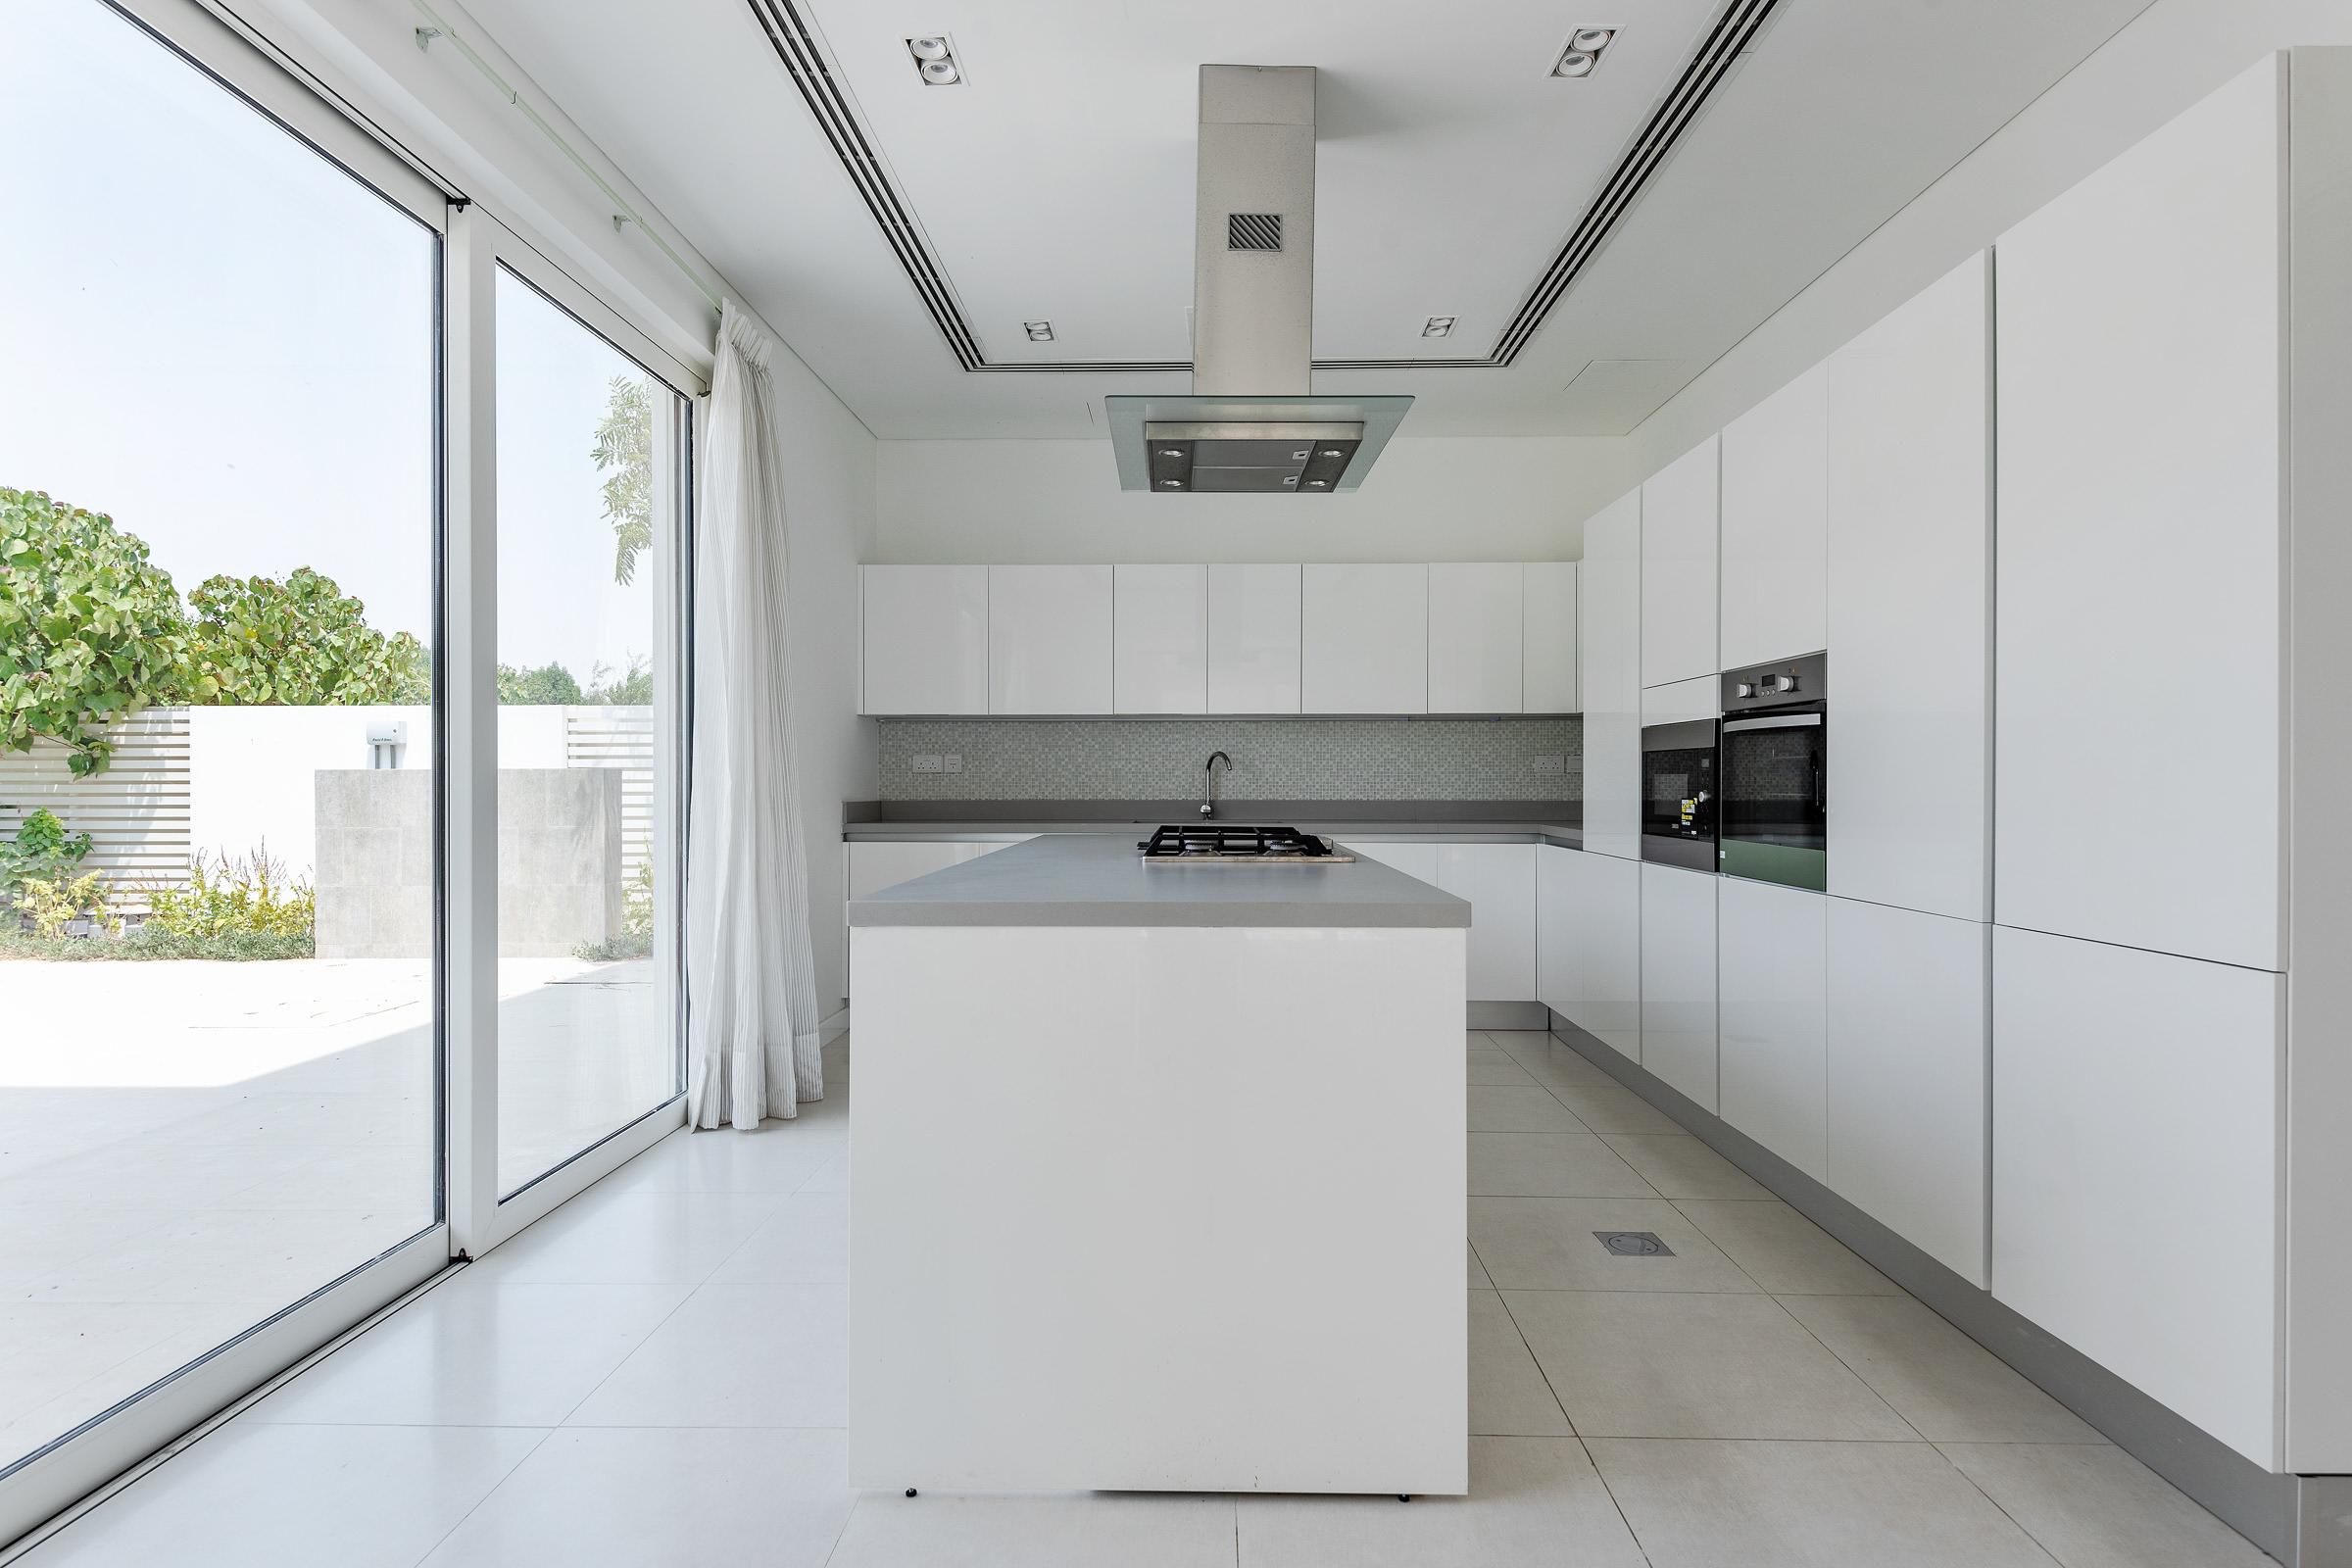 Exclusive Best Priced Nest villa for sale